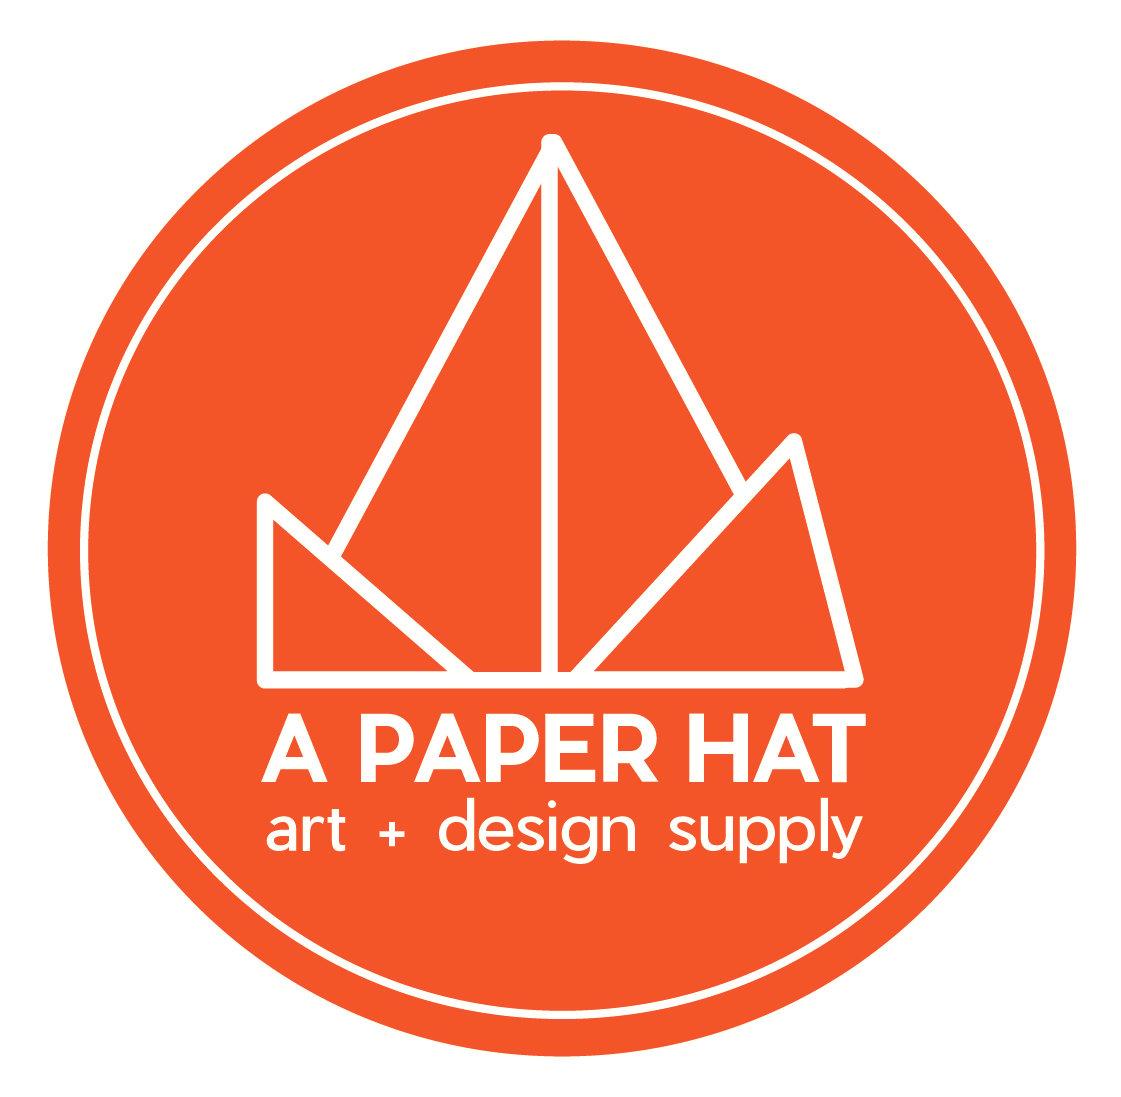 a paper hat